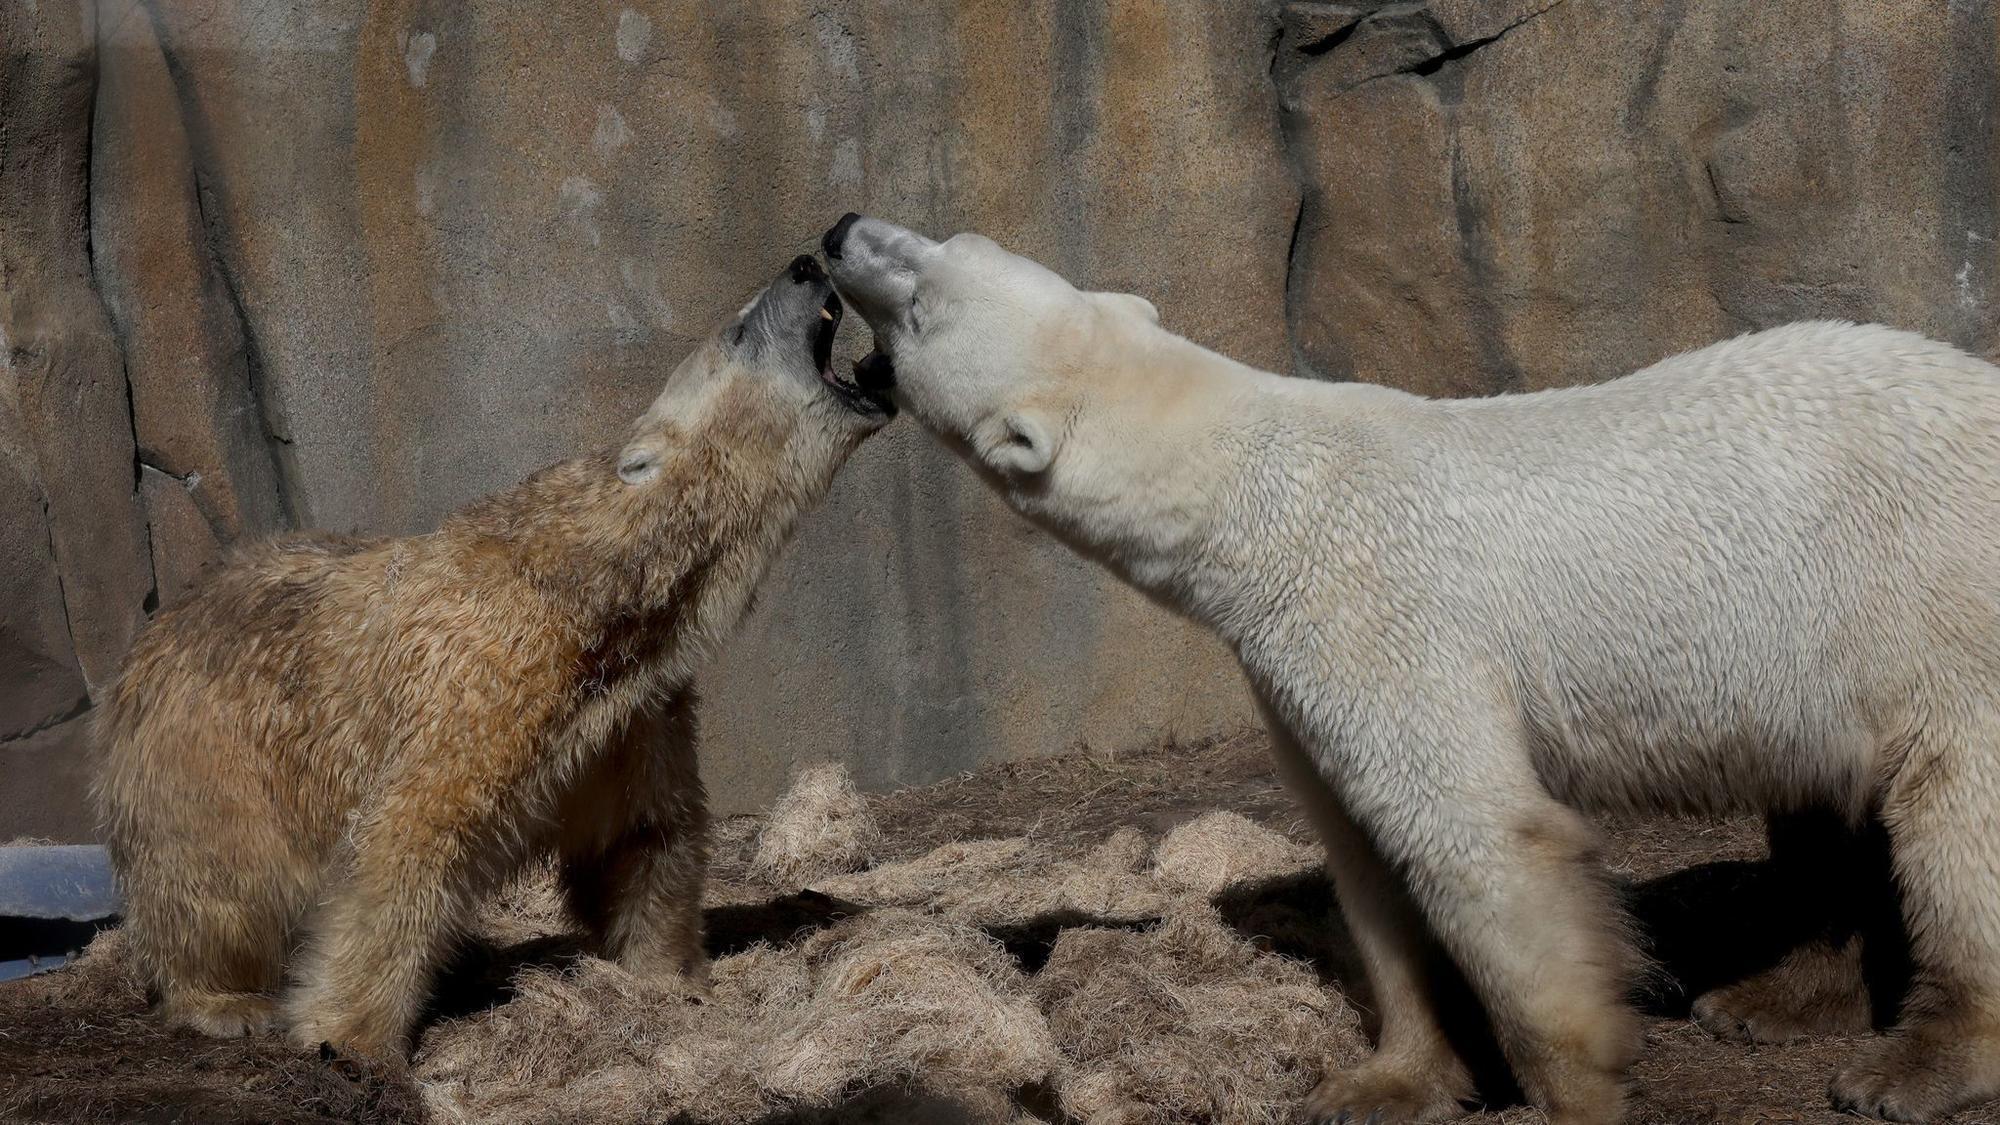 New Female Polar Bear At Lincoln Park Zoo Has Its Mate